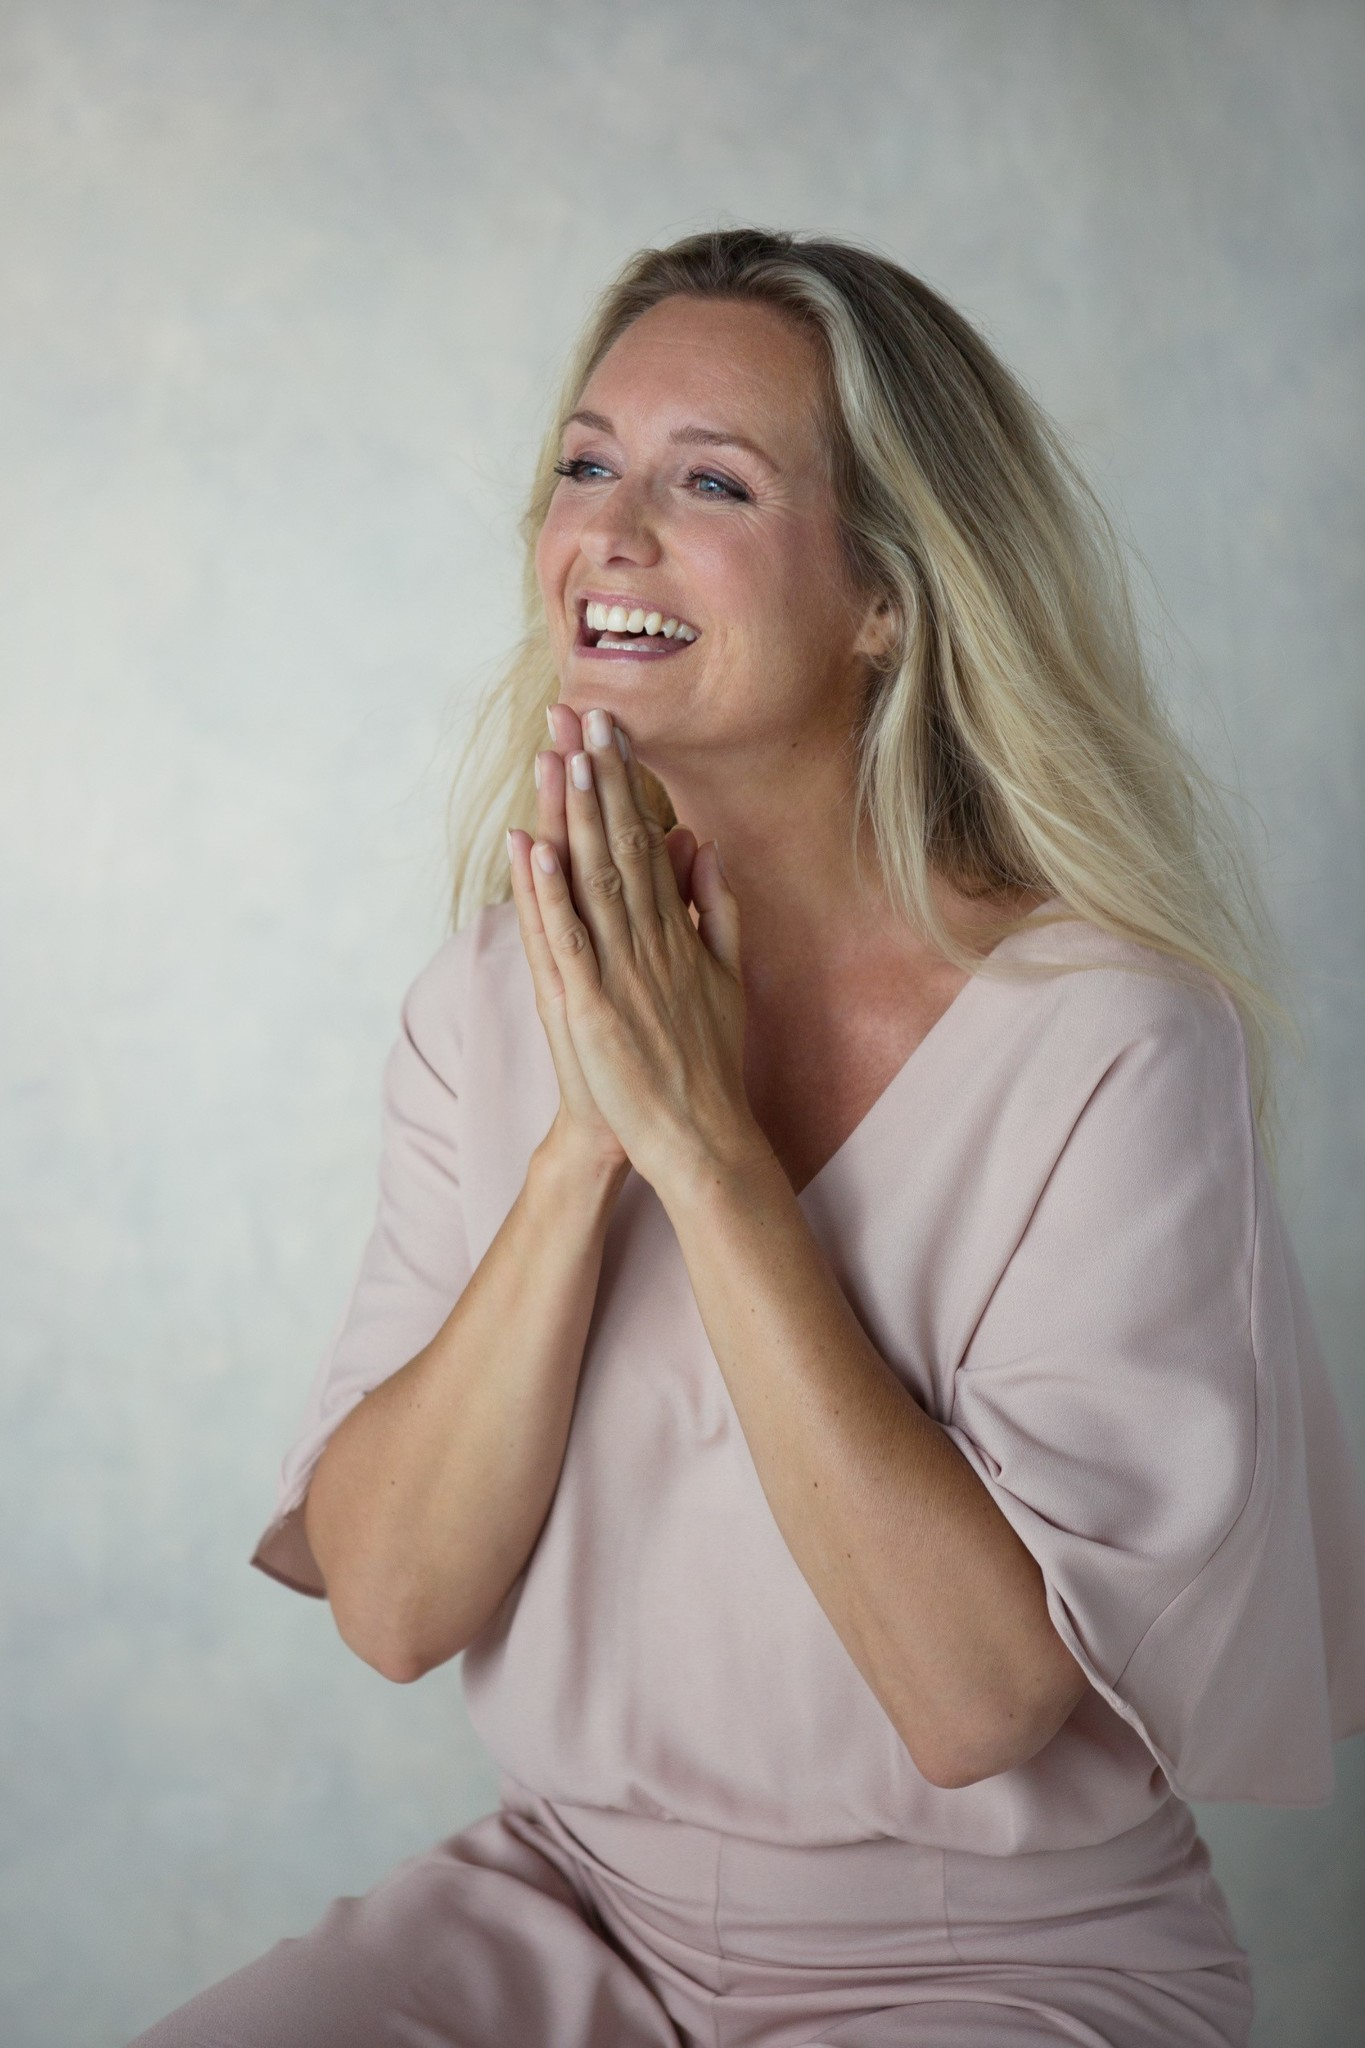 Myrna van Kemenade